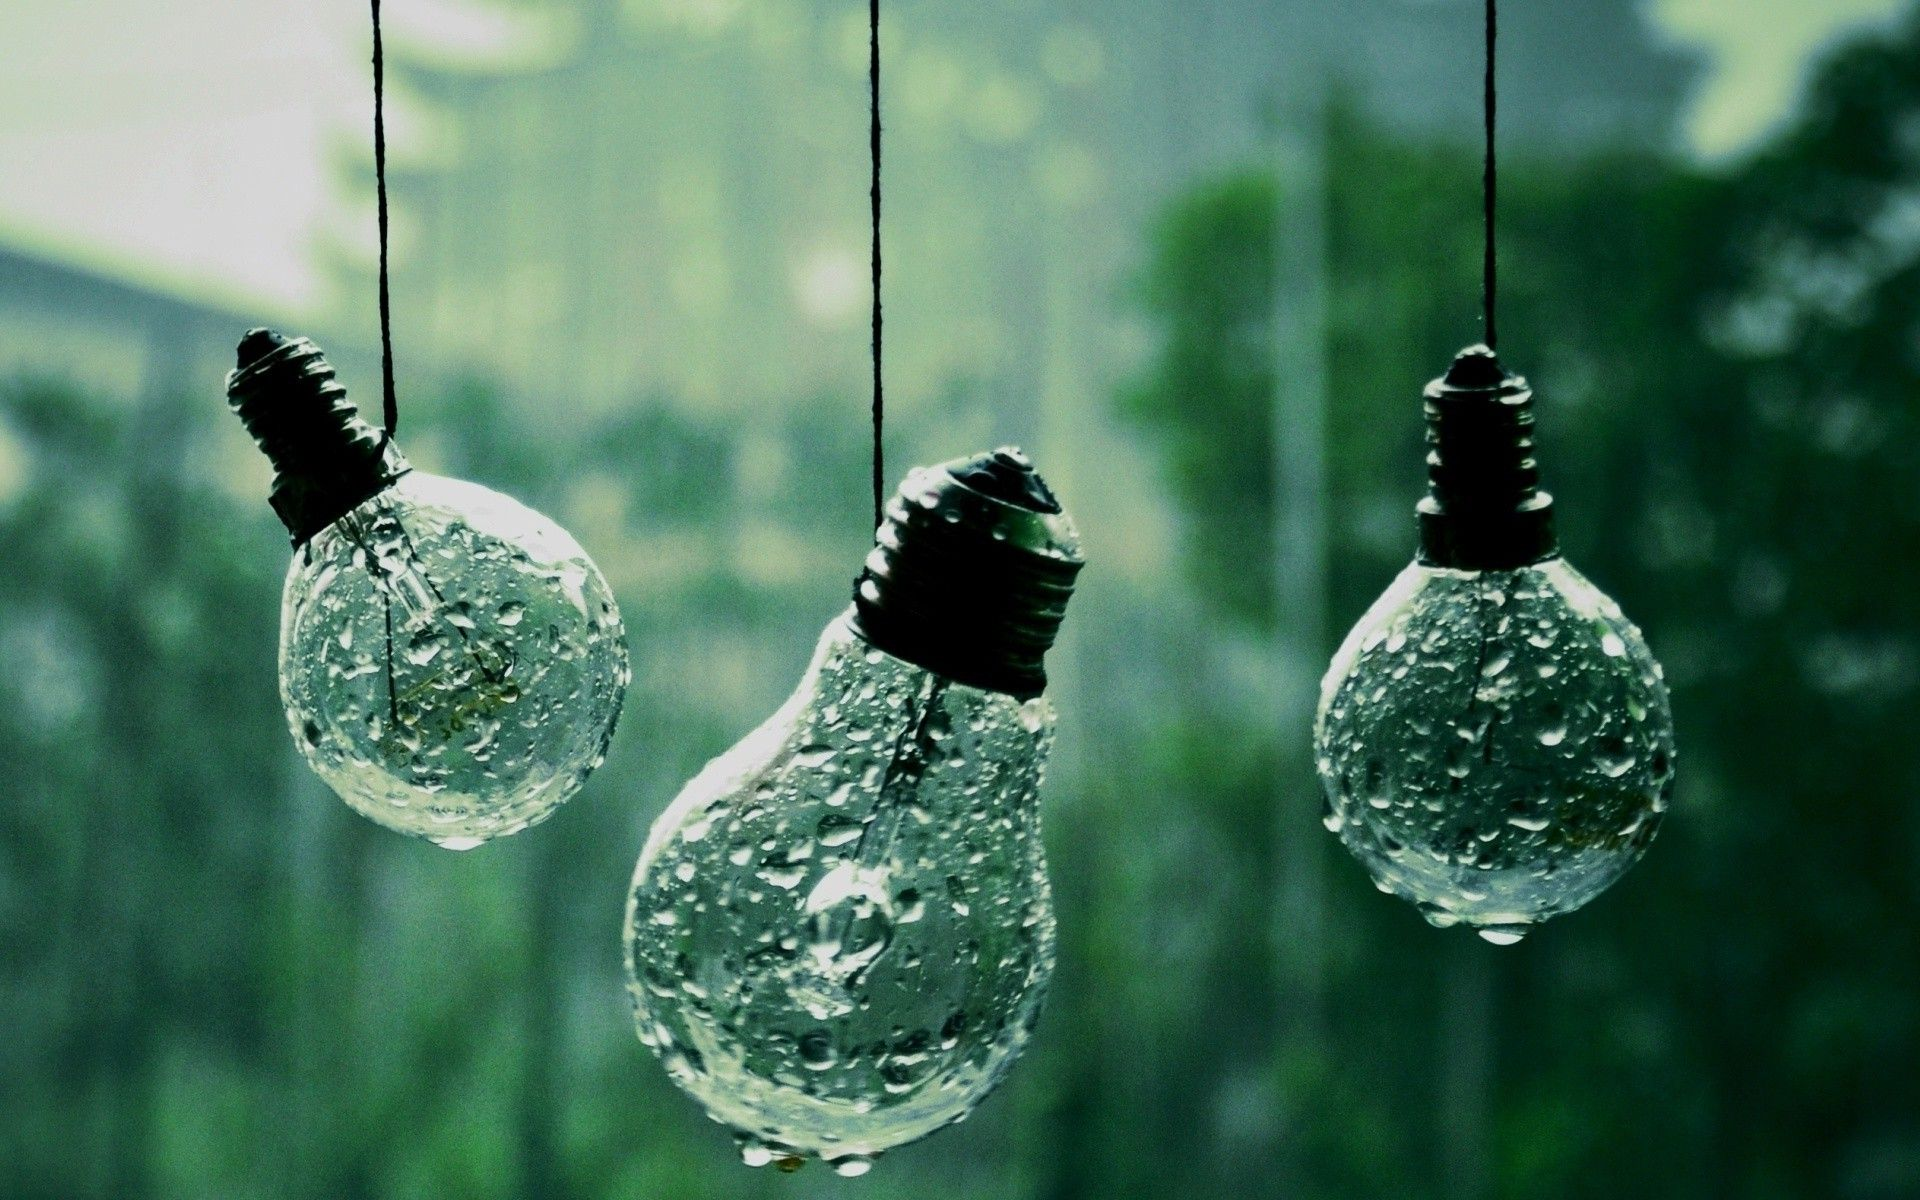 Light Bulb Photography  Wallpapers Full Hd Wallpaper